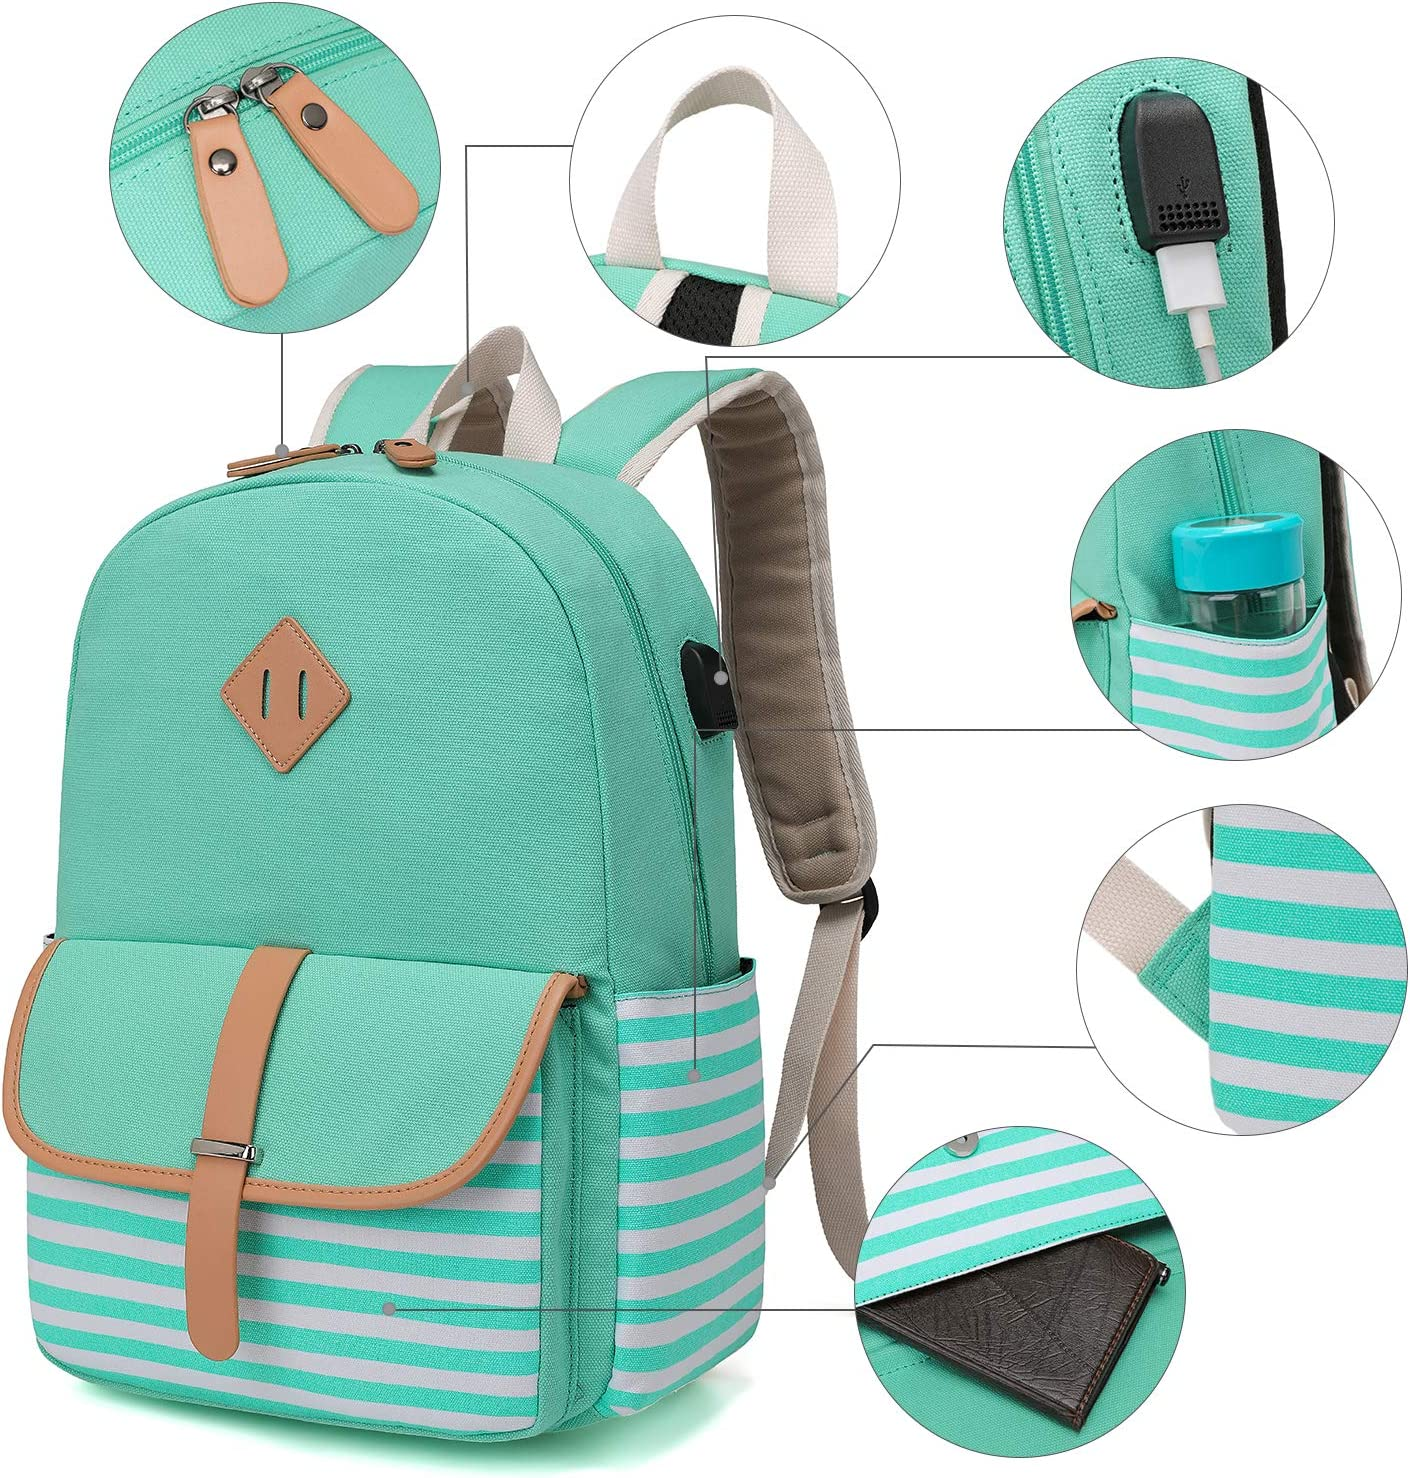 Leather Backpack Colorful Wind Surf Boat School College Bookbag Travel Office Bag Laptop Backpack for Women Men